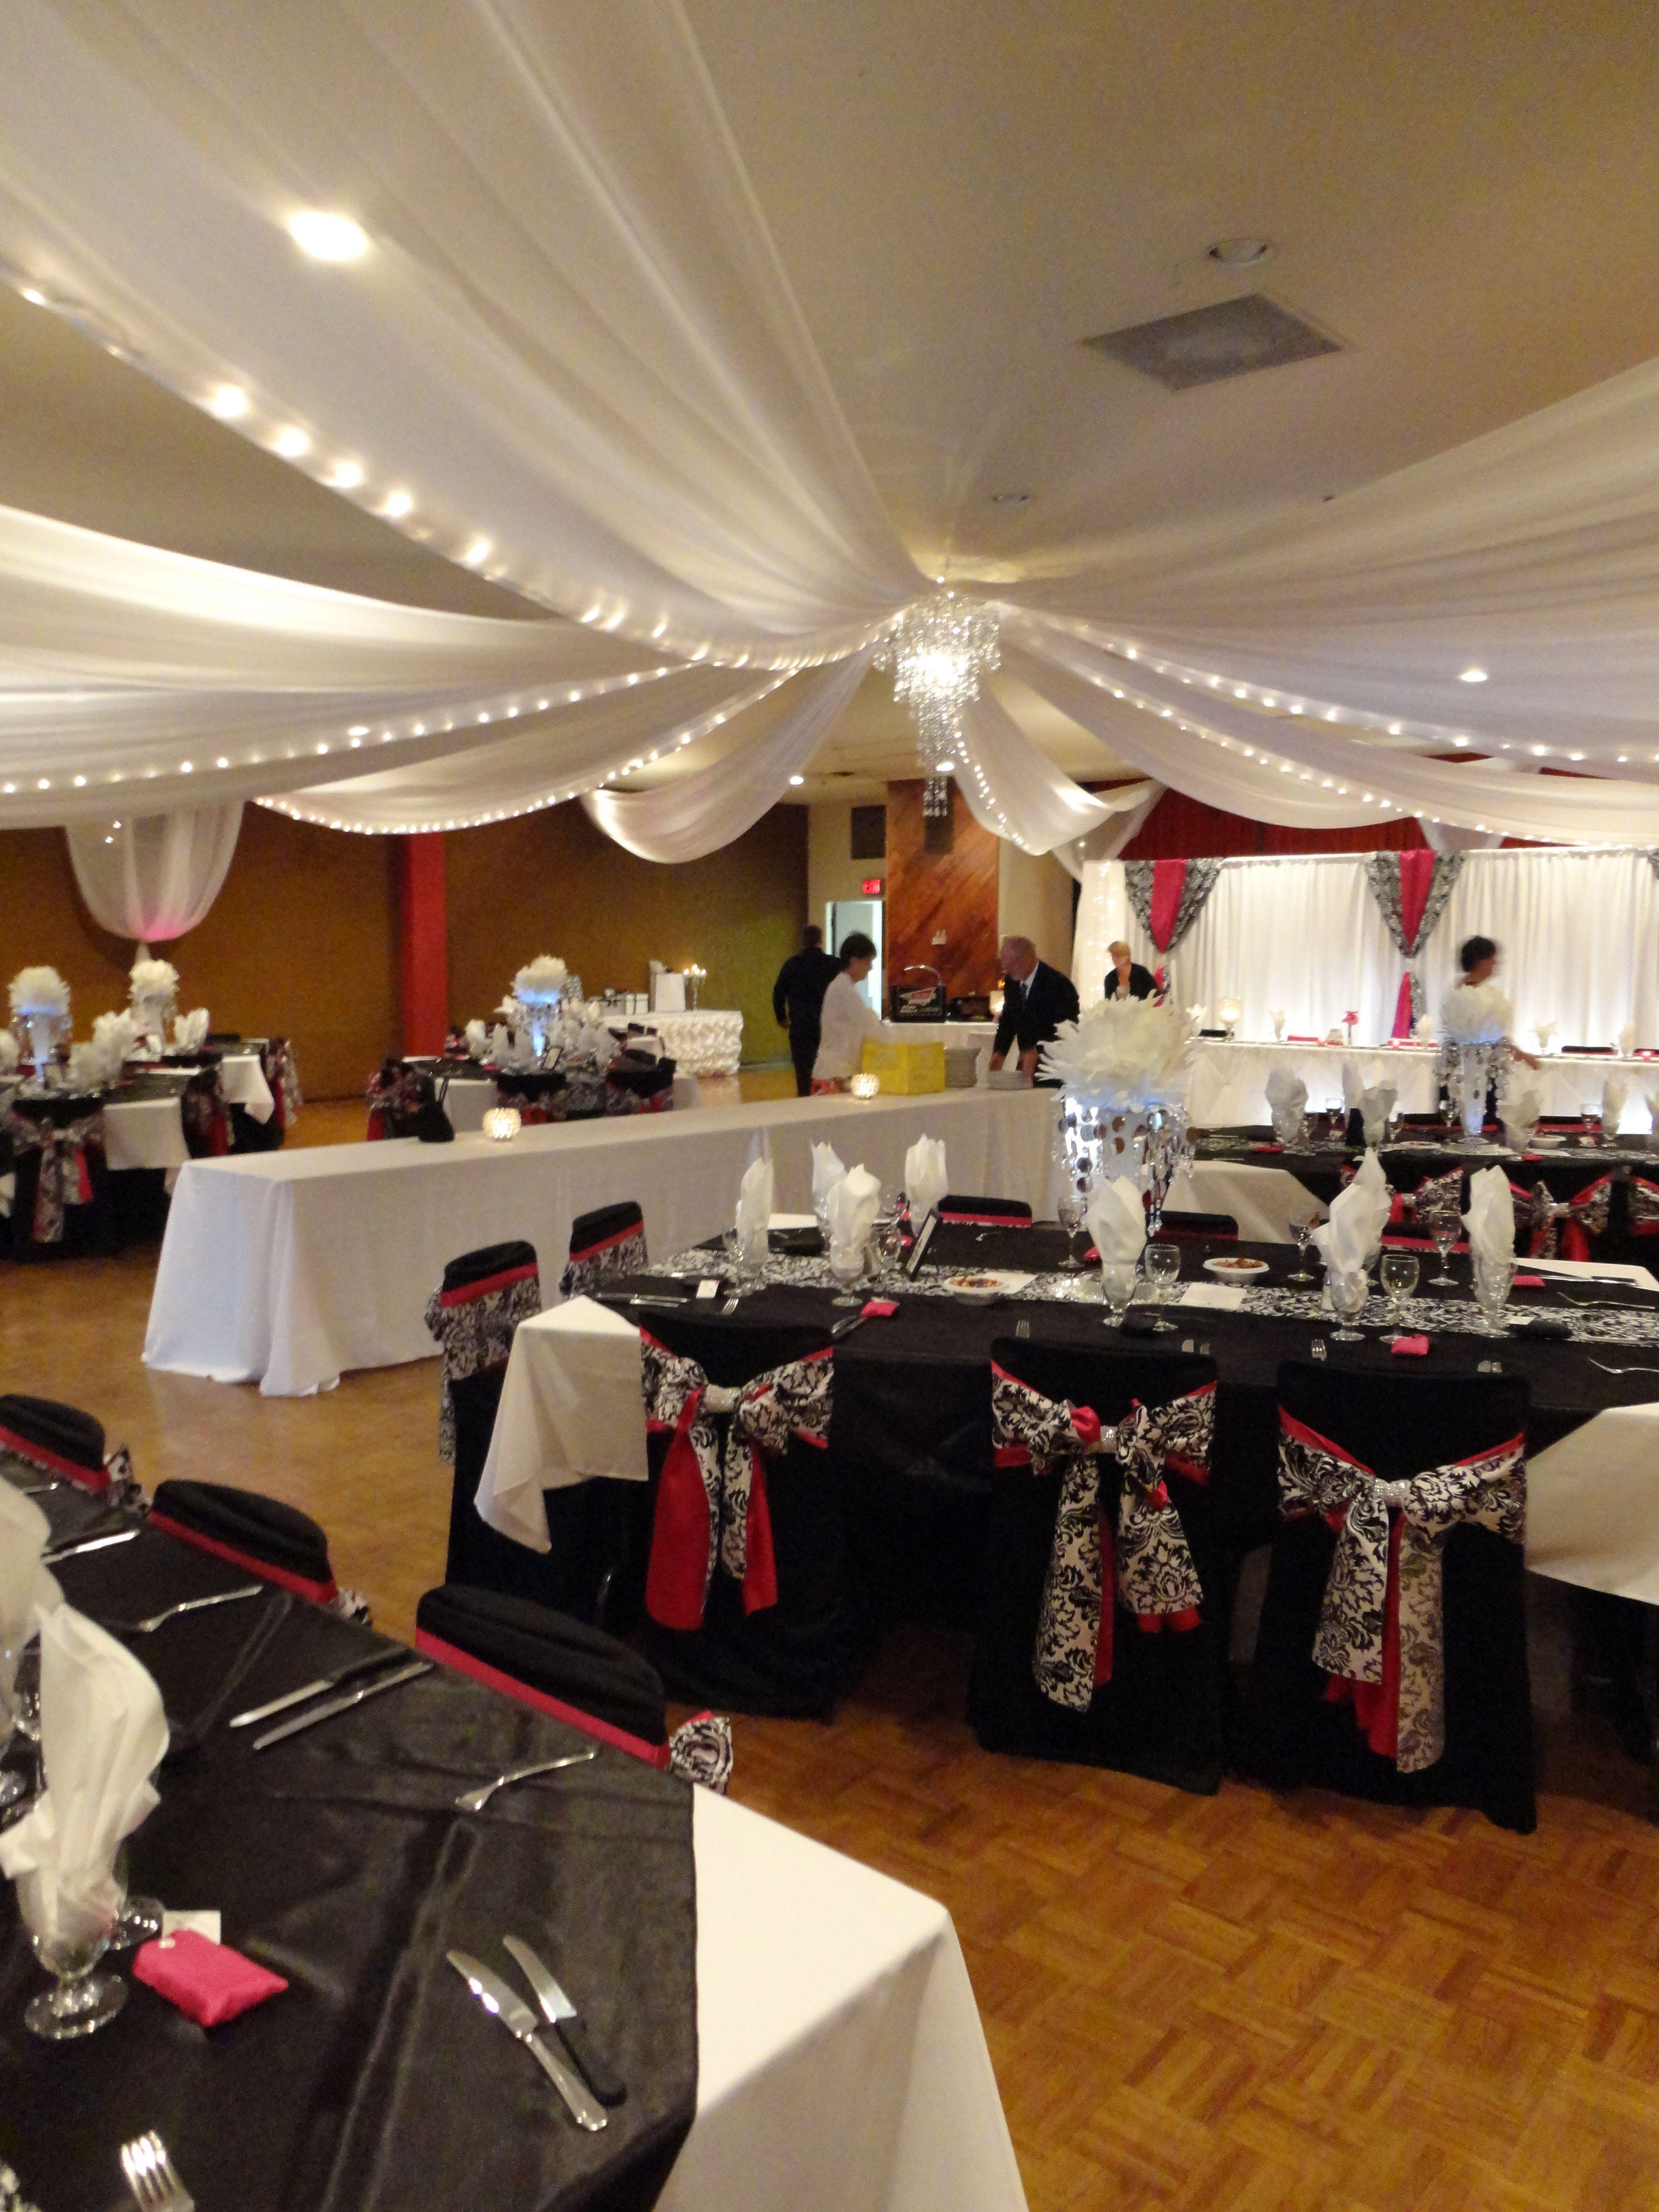 Wedding reception decoration images  Aglow Weddings u Events Sales and Rentals of Extraordinary Wedding